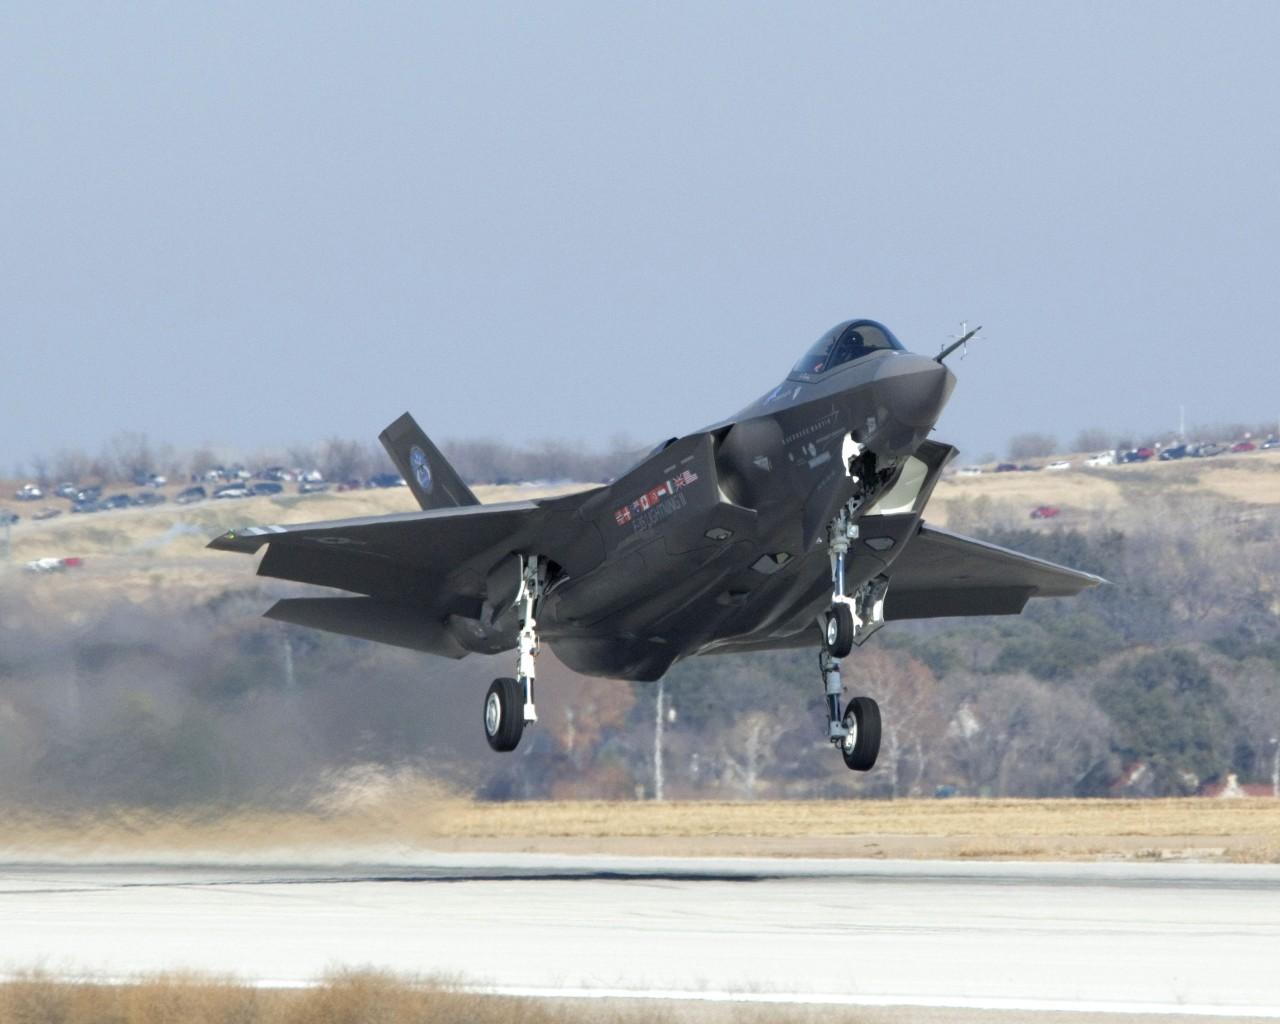 http://1.bp.blogspot.com/-M8vb4_fPgAU/Td1n-qBnxAI/AAAAAAAAEnE/4j5KOdUv02E/s1600/F-35+Lightning+II+fighter+jet+%25284%2529.jpg